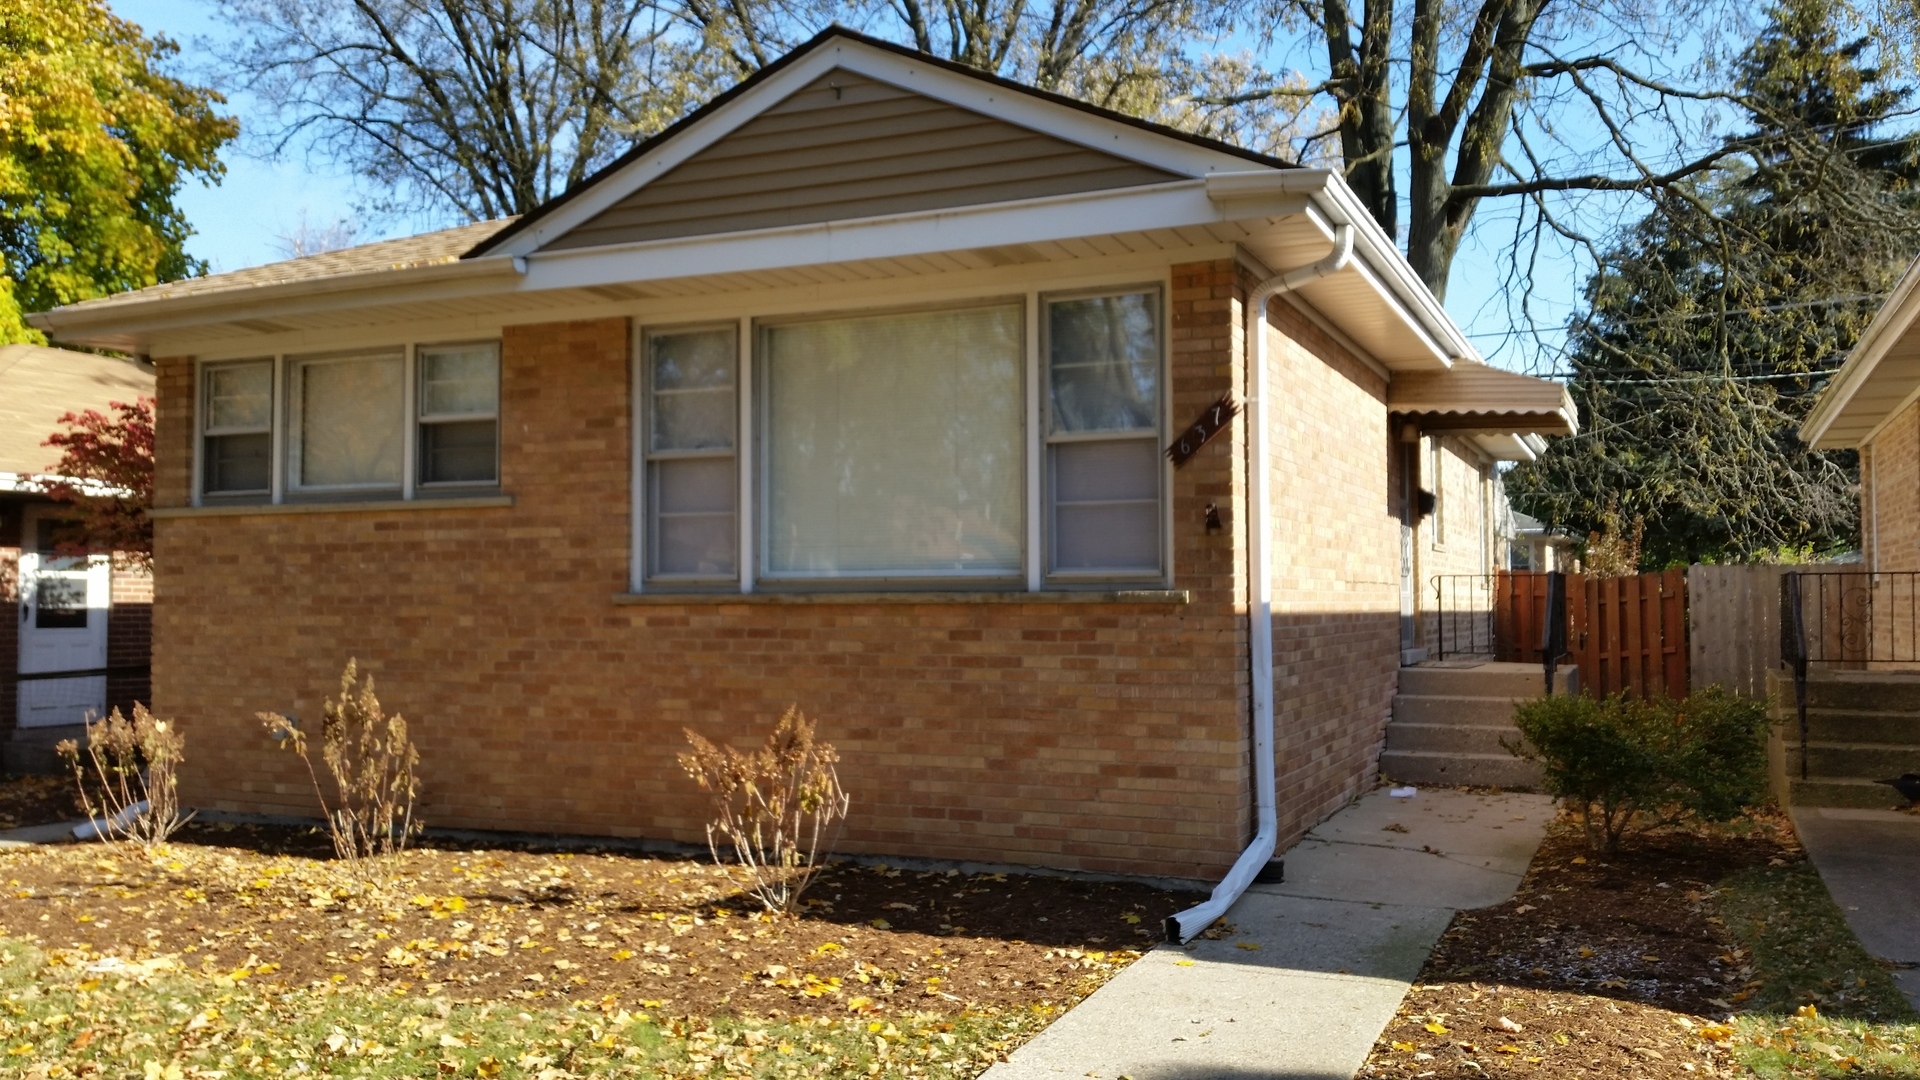 637 Dodge Avenue, Evanston in Cook County, IL 60202 Home for Sale